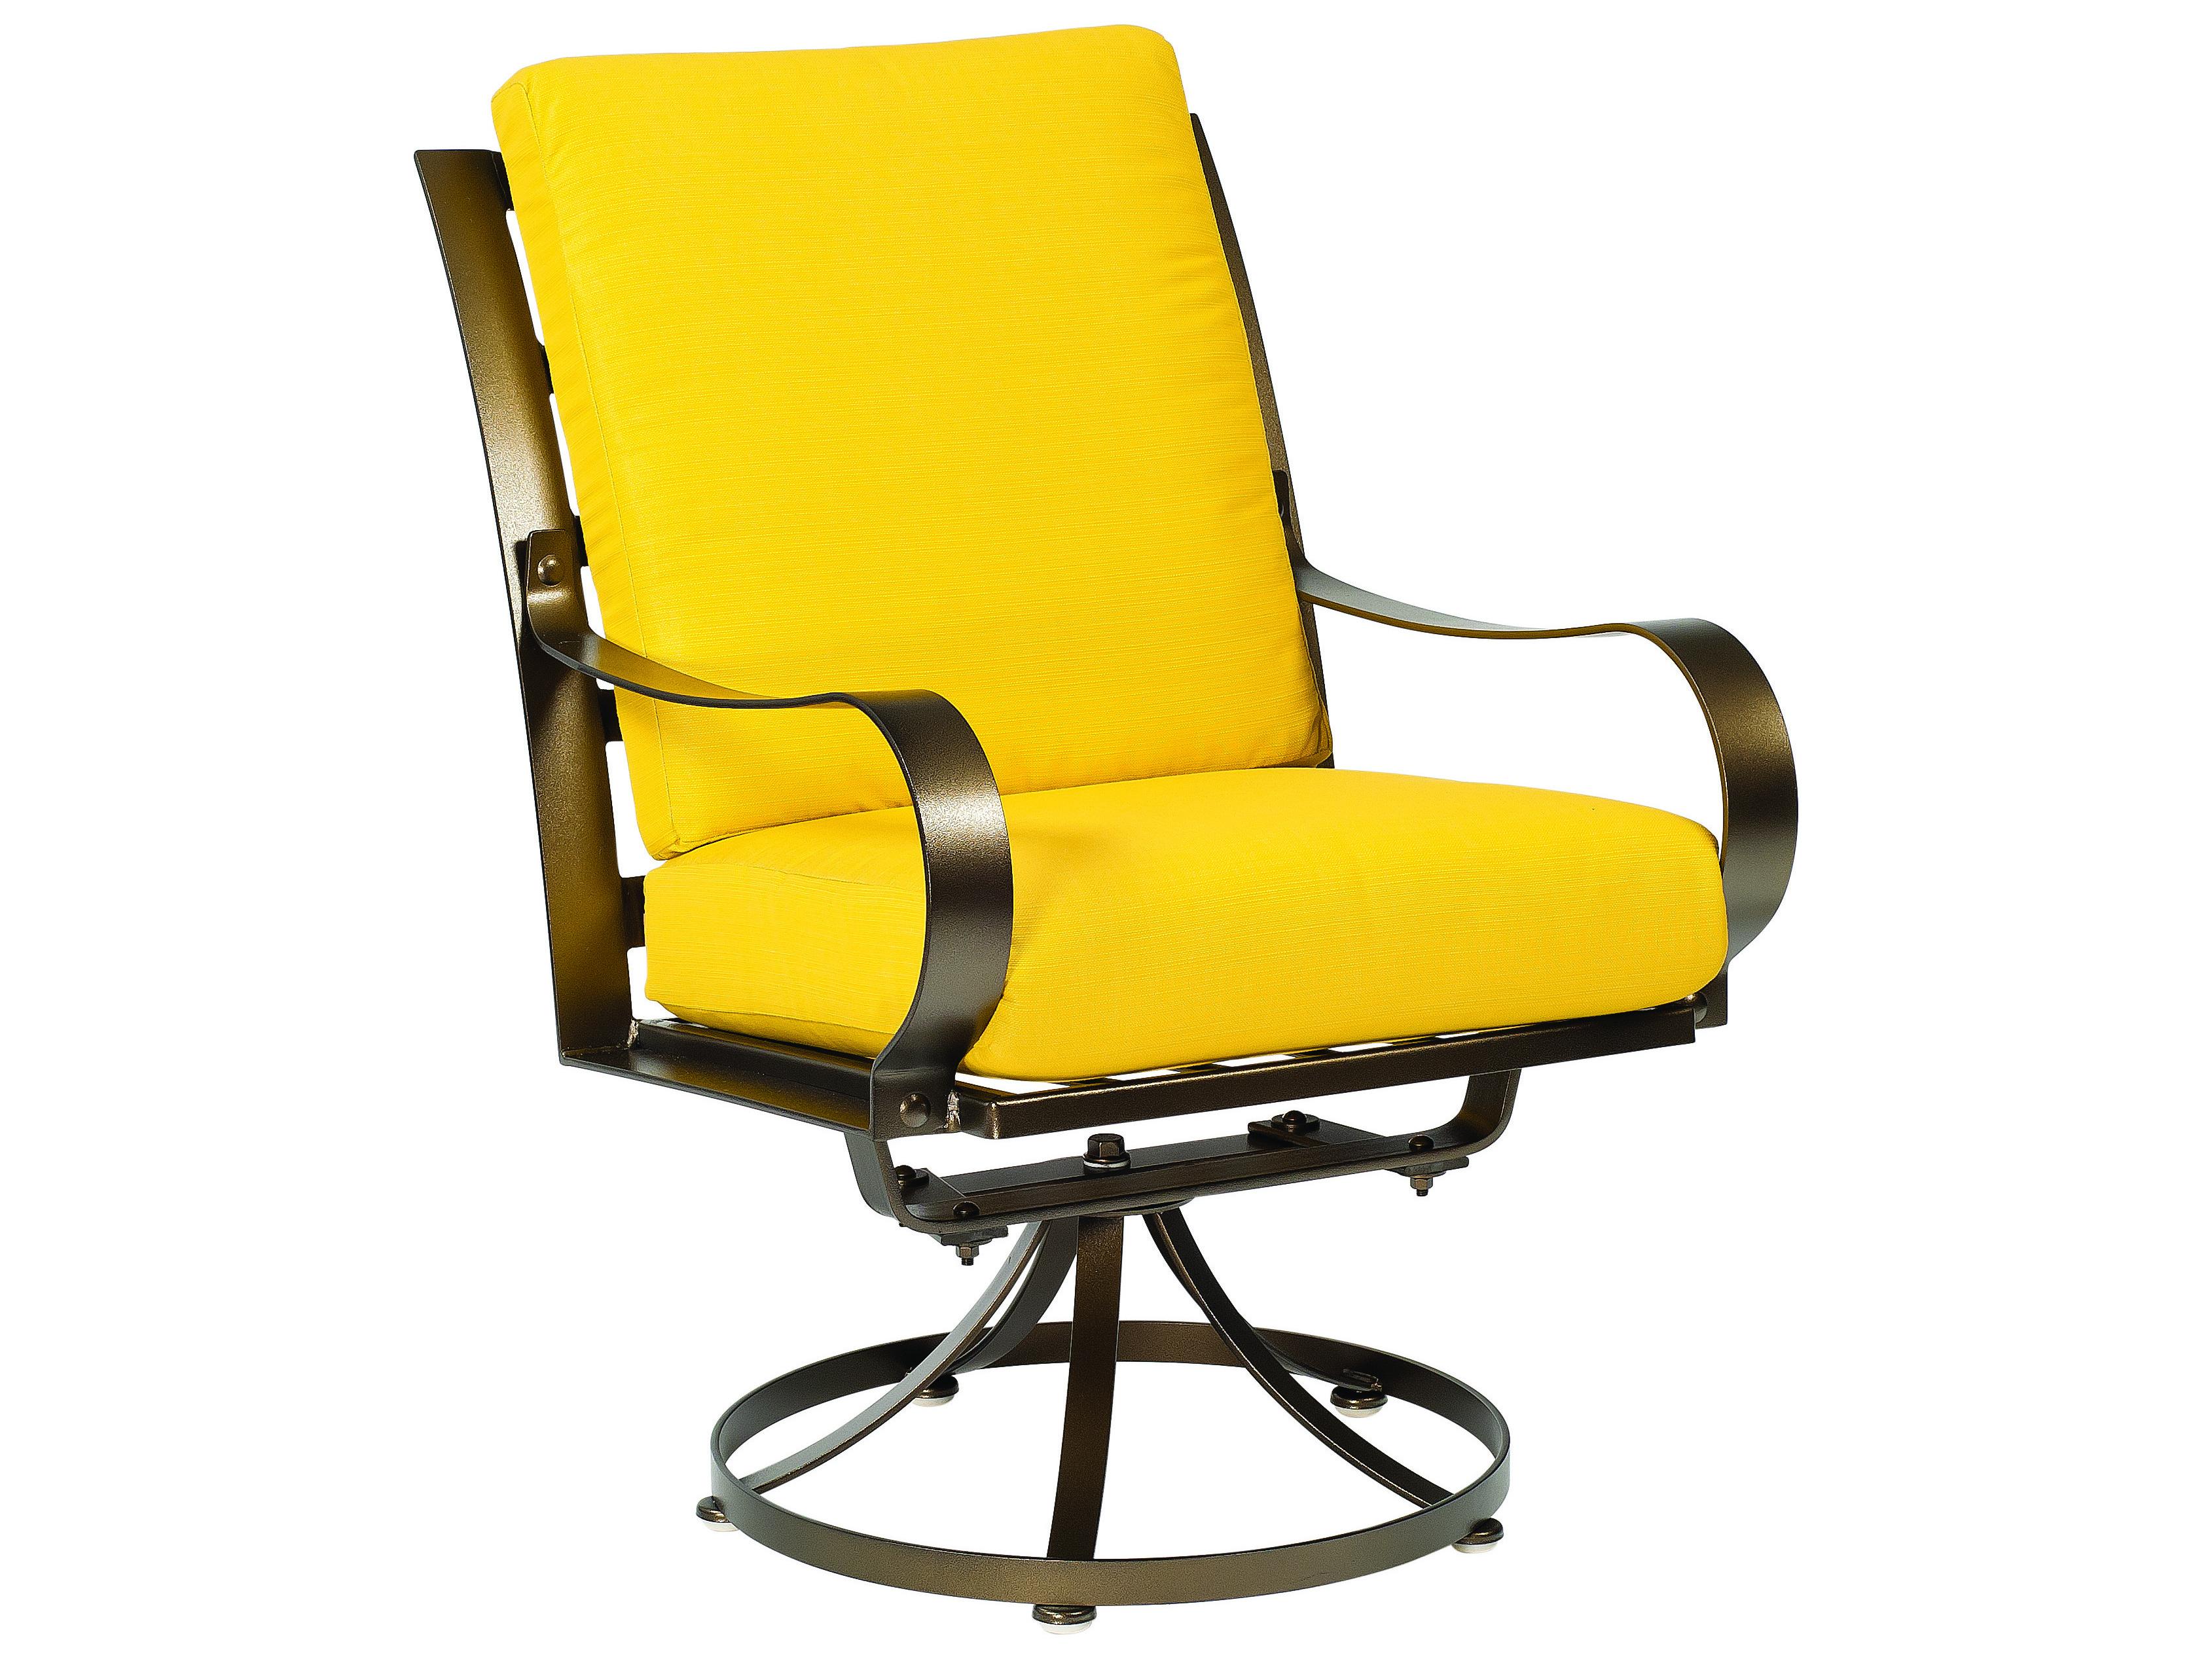 Woodard Cascade Swivel Dining Chair Replacement Cushions ...